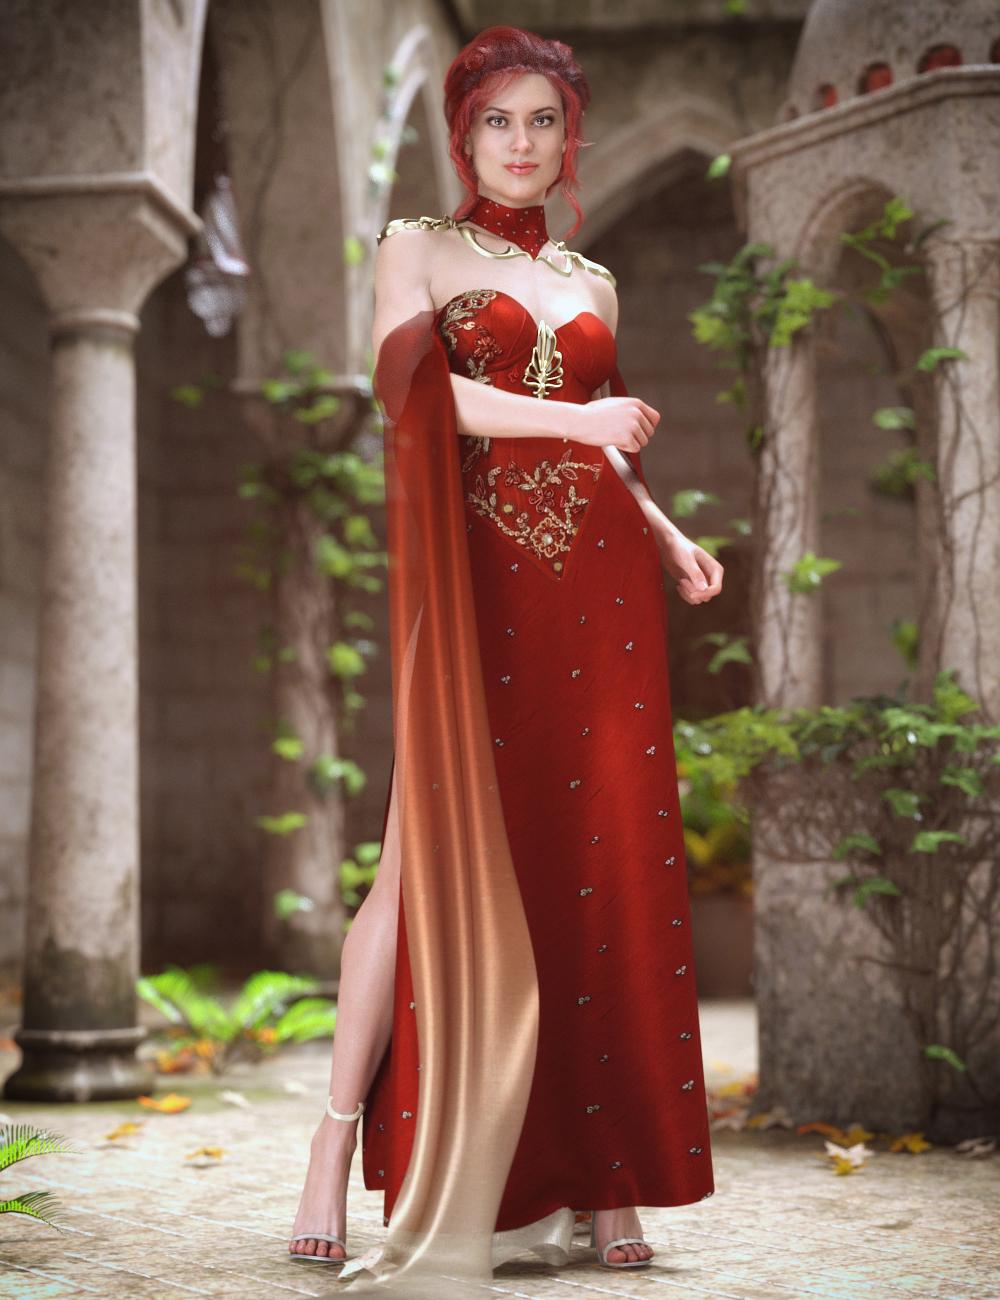 dForce Fantasy Cape Outfit for Genesis 8 Female(s) by: NikisatezSarsa, 3D Models by Daz 3D